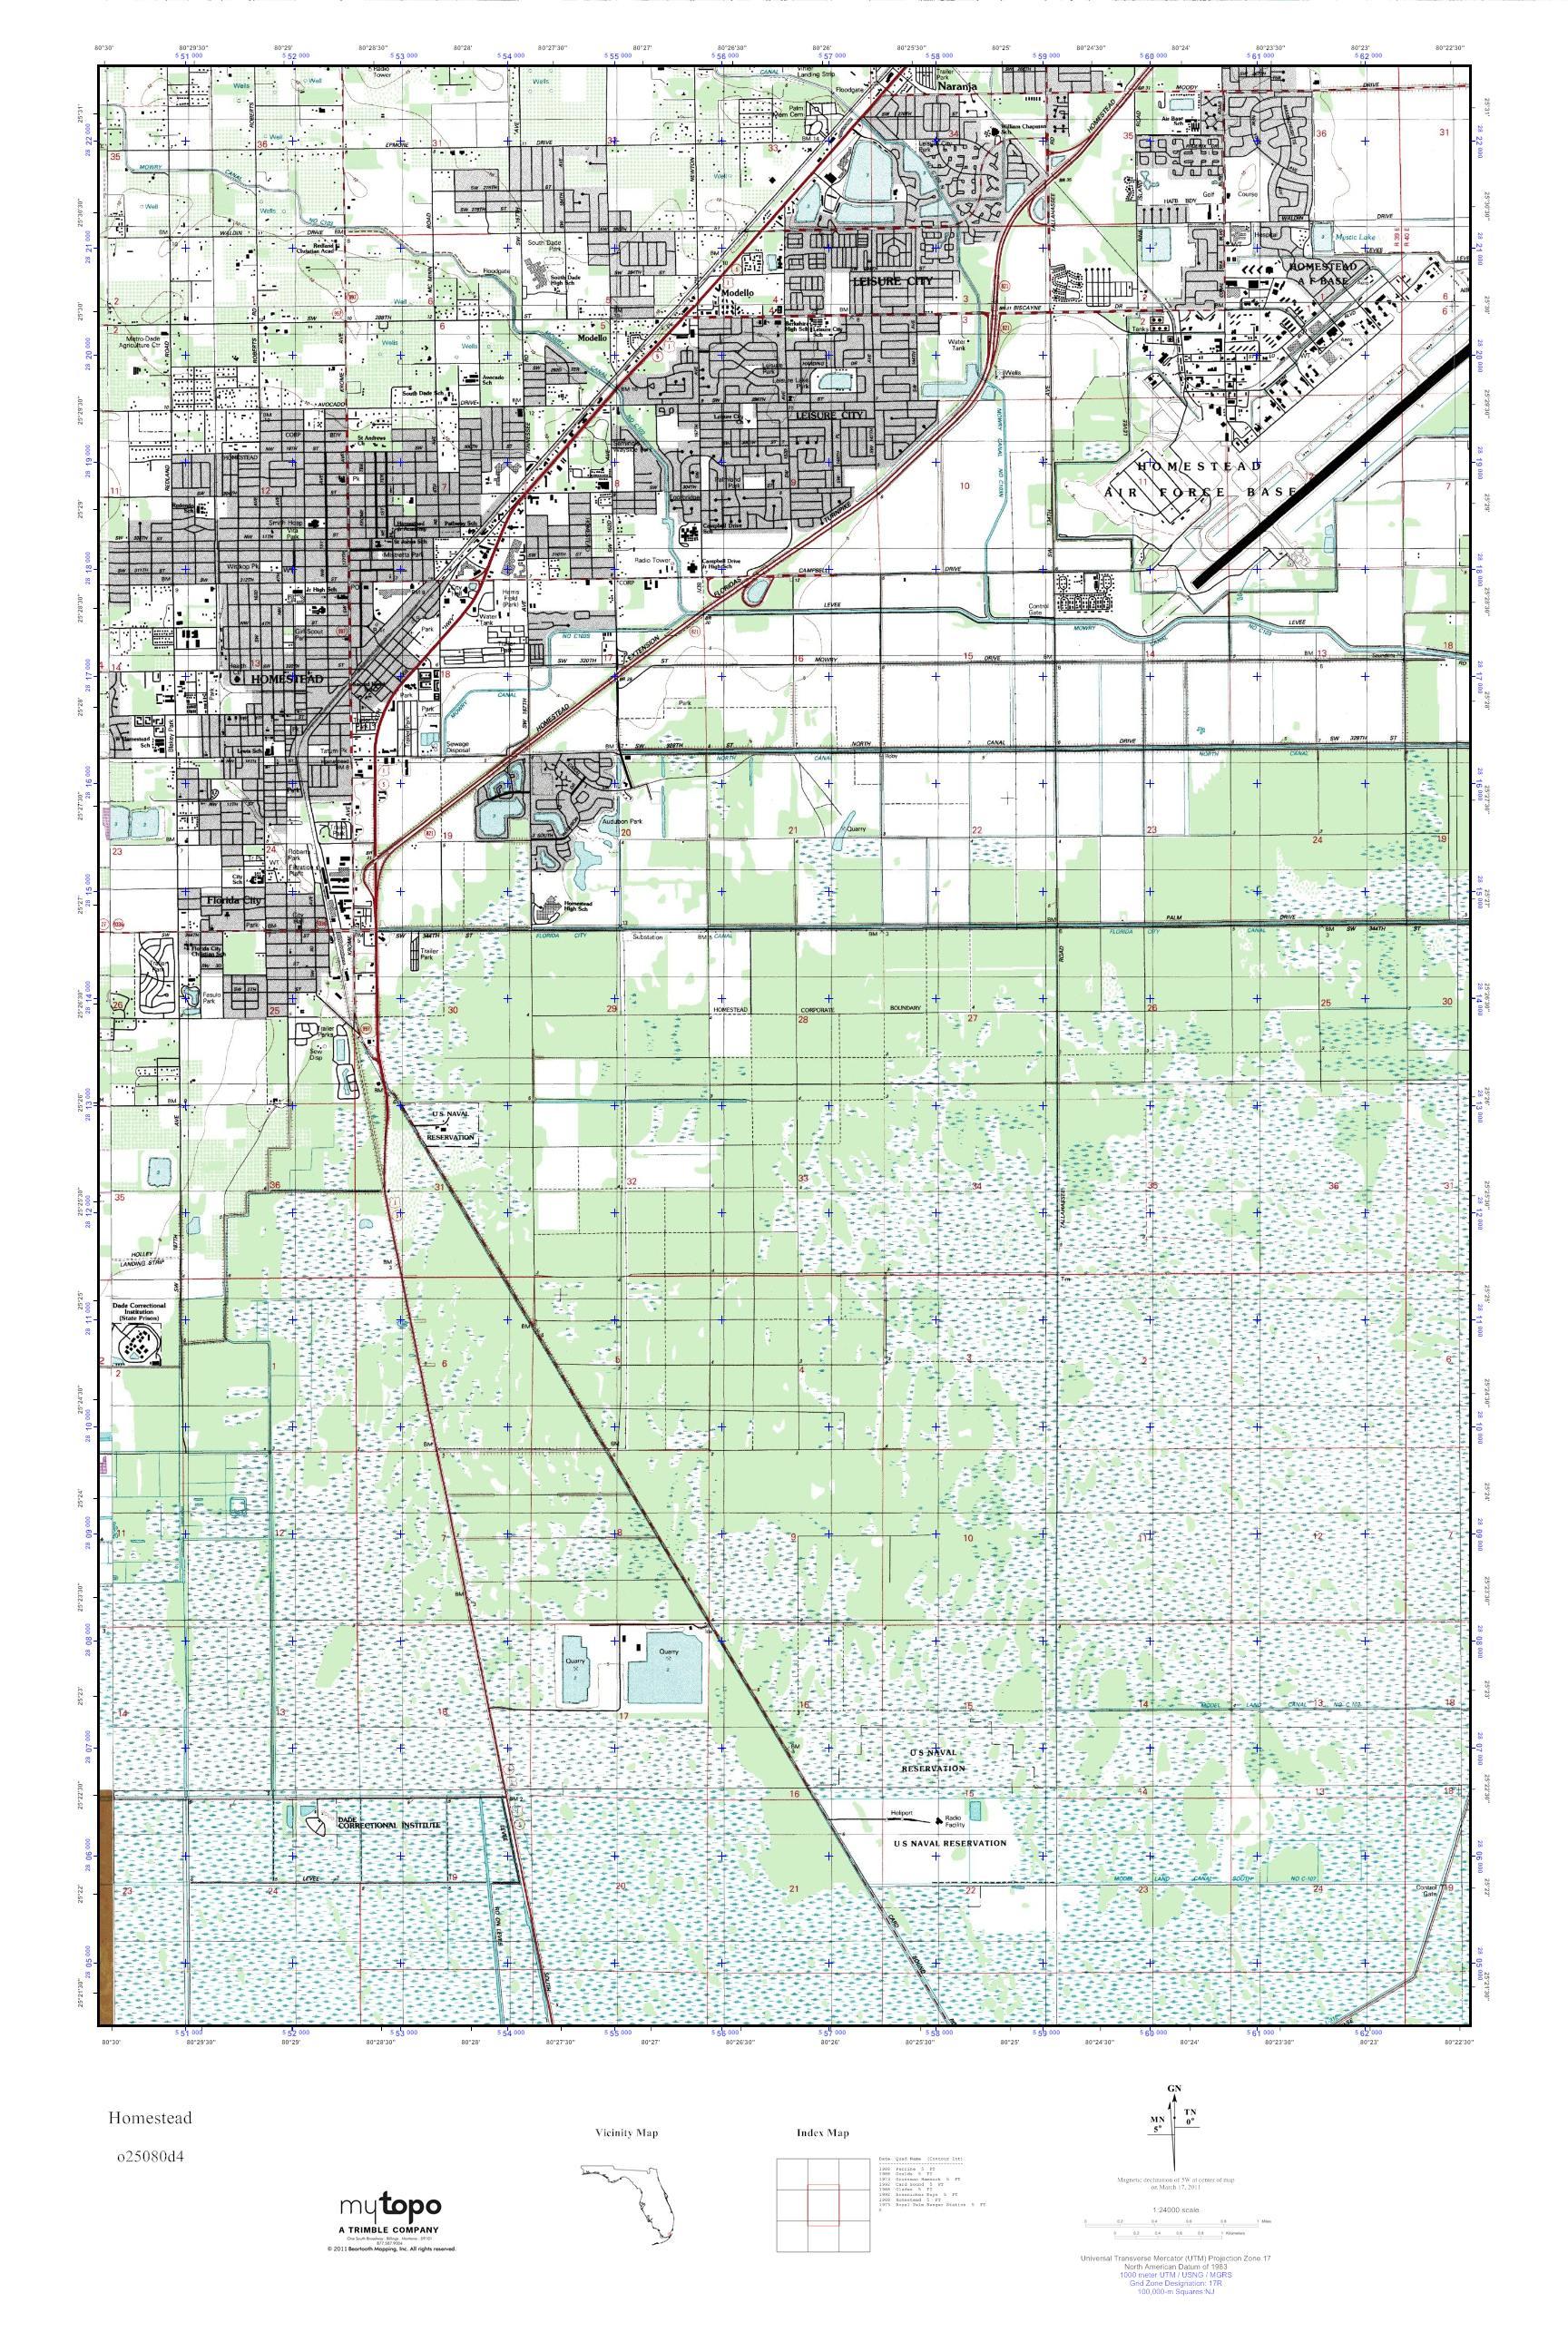 Homestead Florida Map.Mytopo Homestead Florida Usgs Quad Topo Map